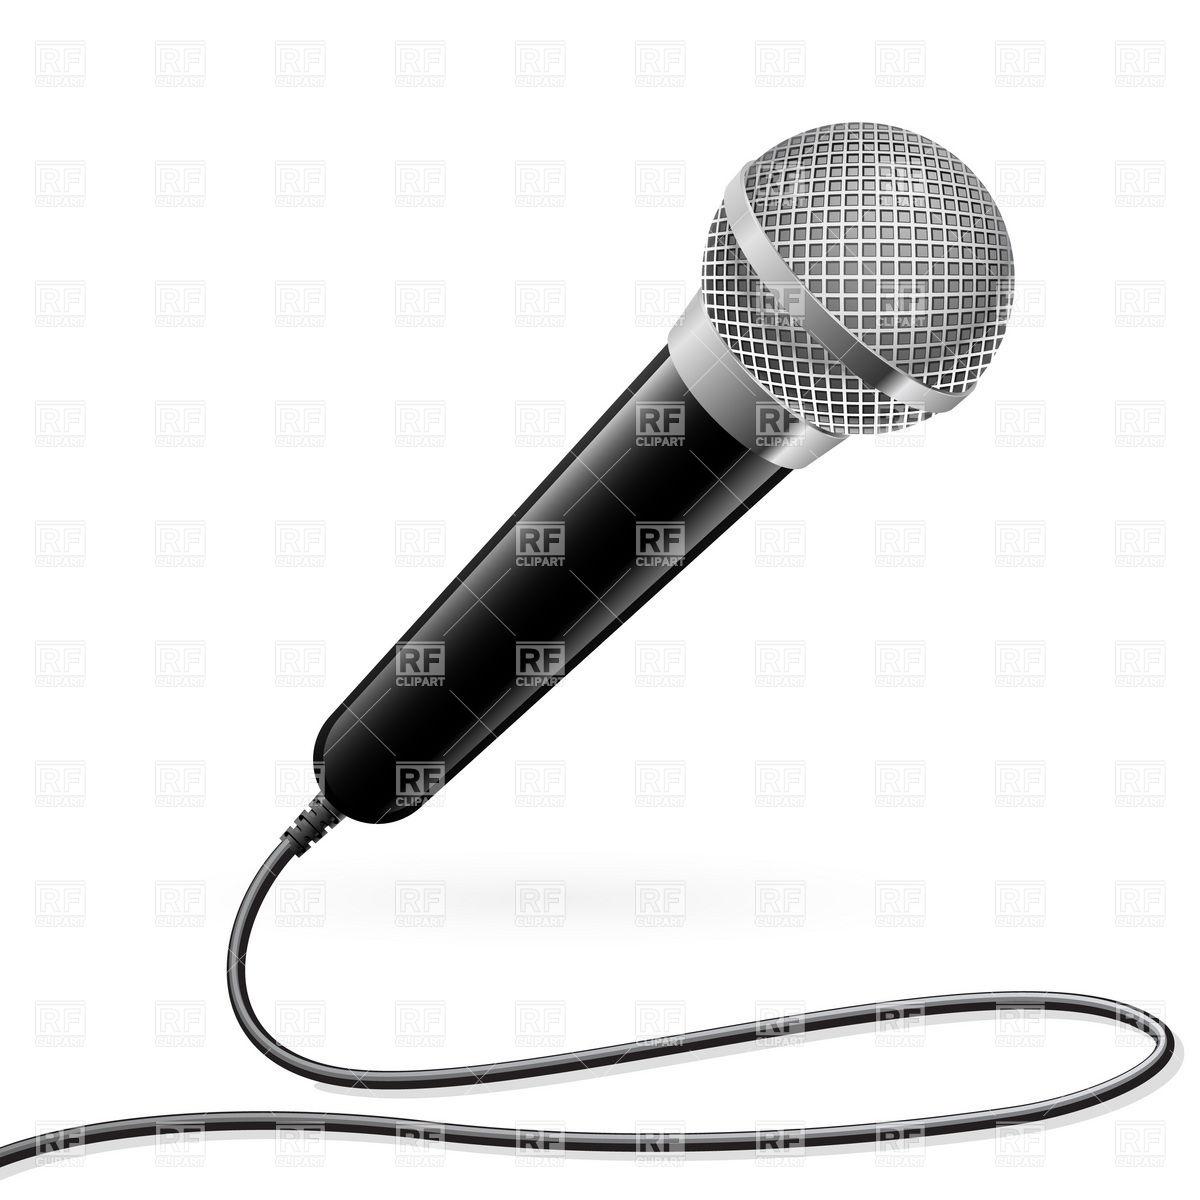 studio%20microphone%20clipart